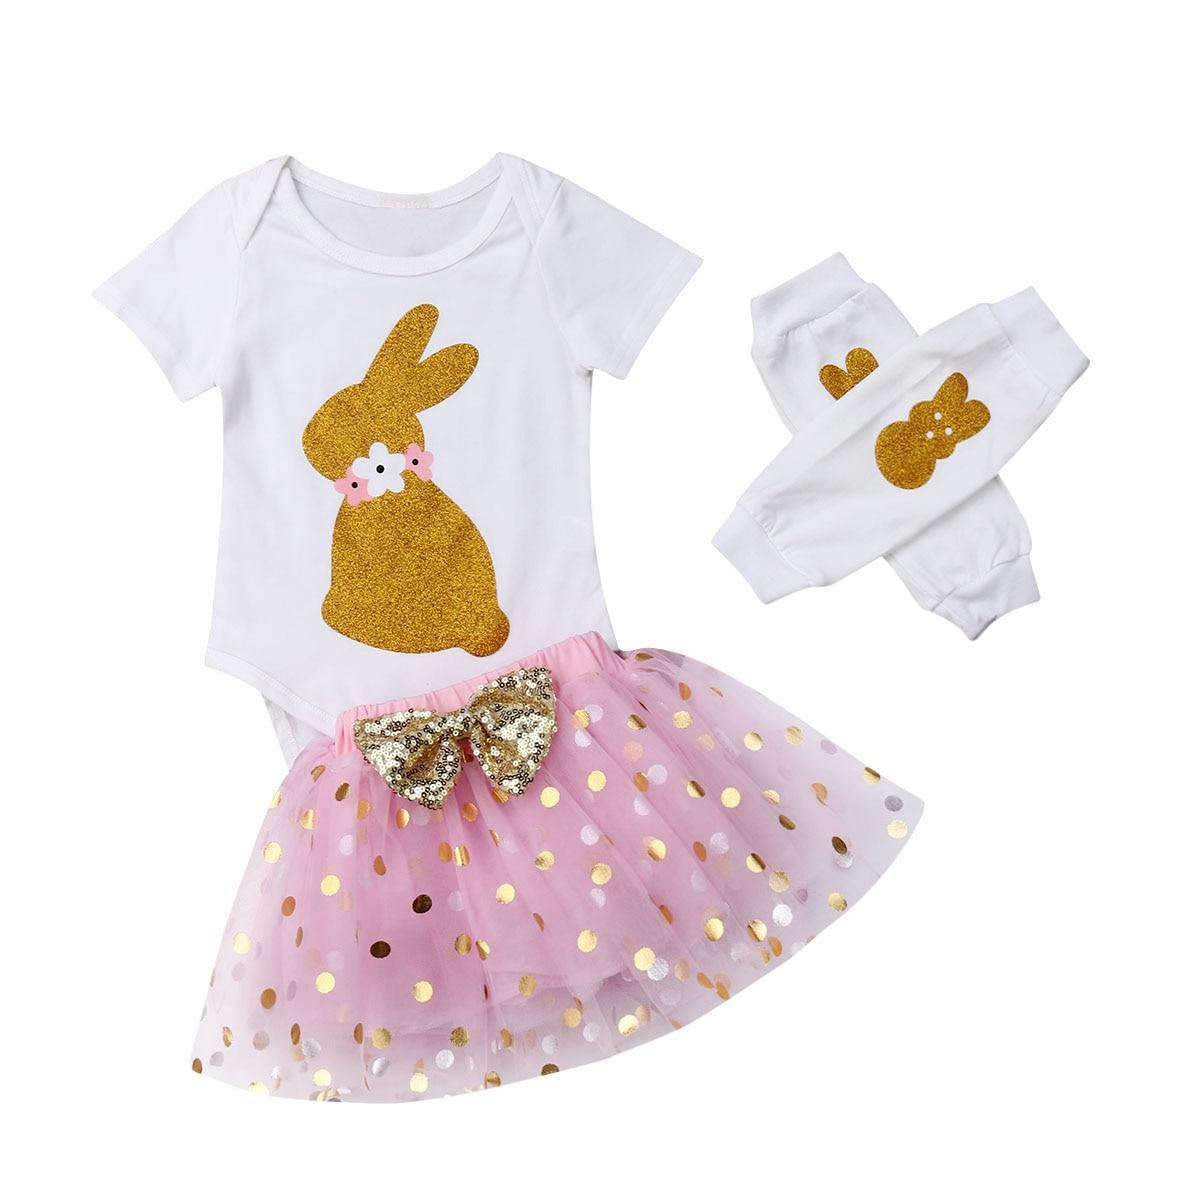 0-24 M Leuke Pasgeboren Baby Meisje Korte Mouwen Bunny Katoen Romper Tops Polka Dot Tutu Rok 2 Stuks Outfits Prinses Meisjes Kleding Set Hoge Kwaliteit En Goedkoop